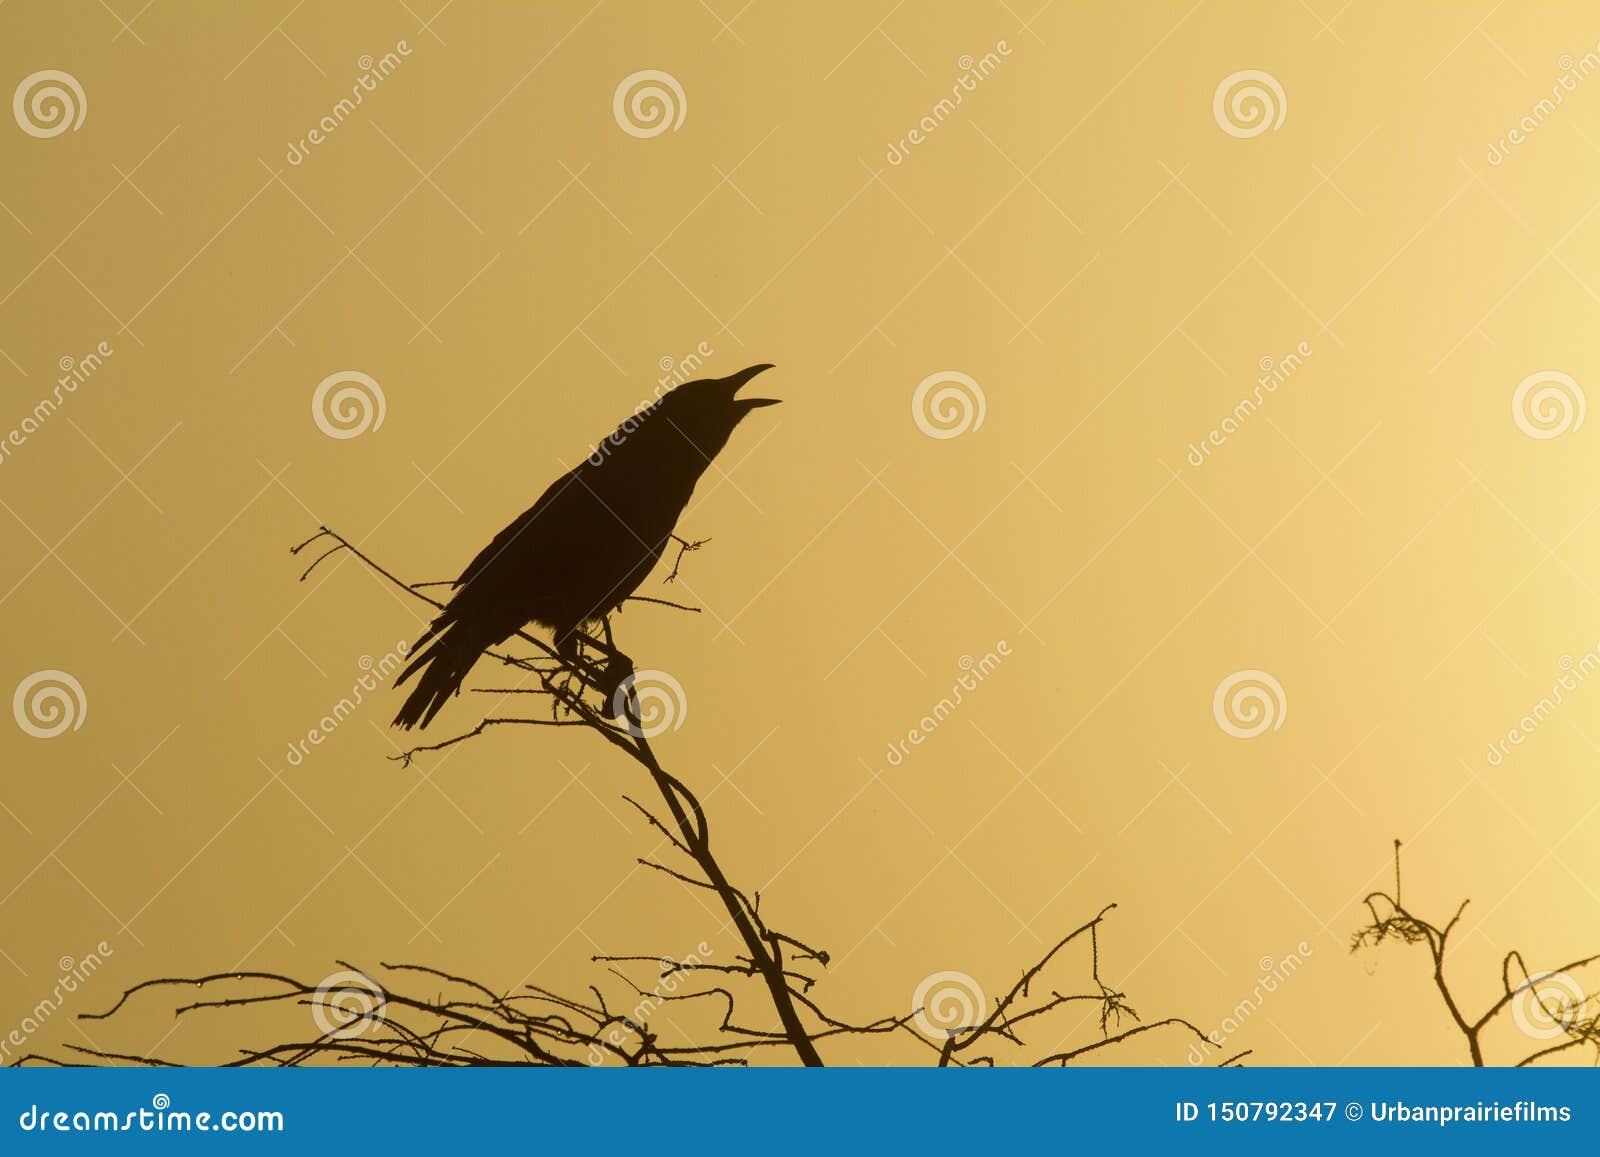 Silueta de un cuervo